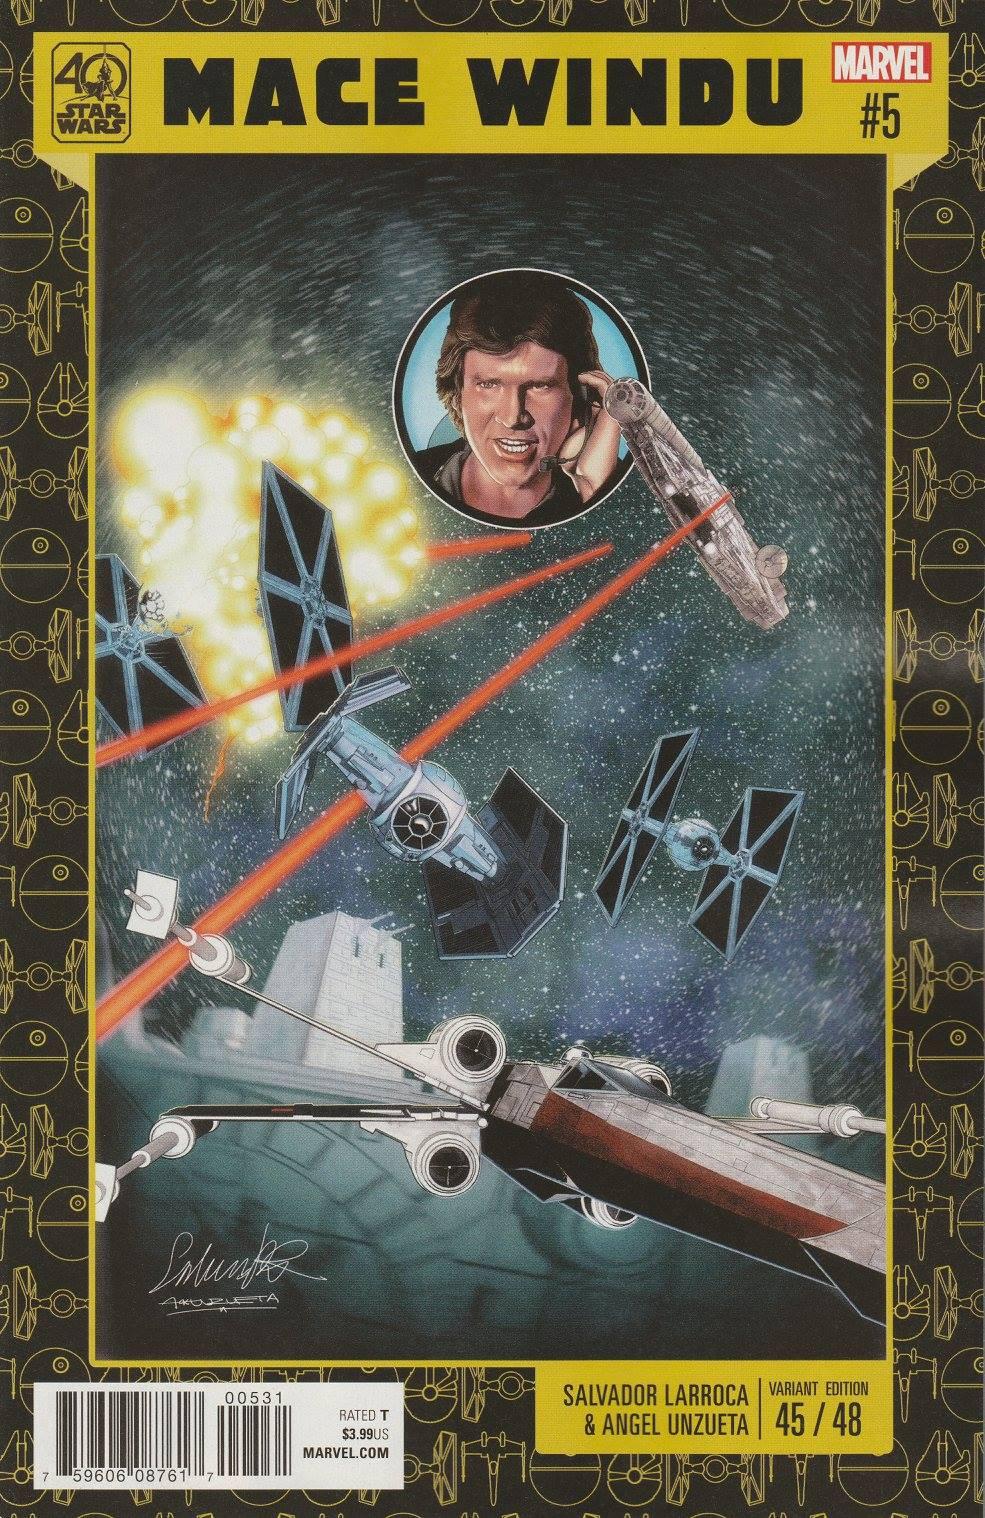 Jedi of the Republic – Mace Windu #5 (Salvador Larroca Star Wars 40th Anniversary Variant Cover) (27.12.2017)